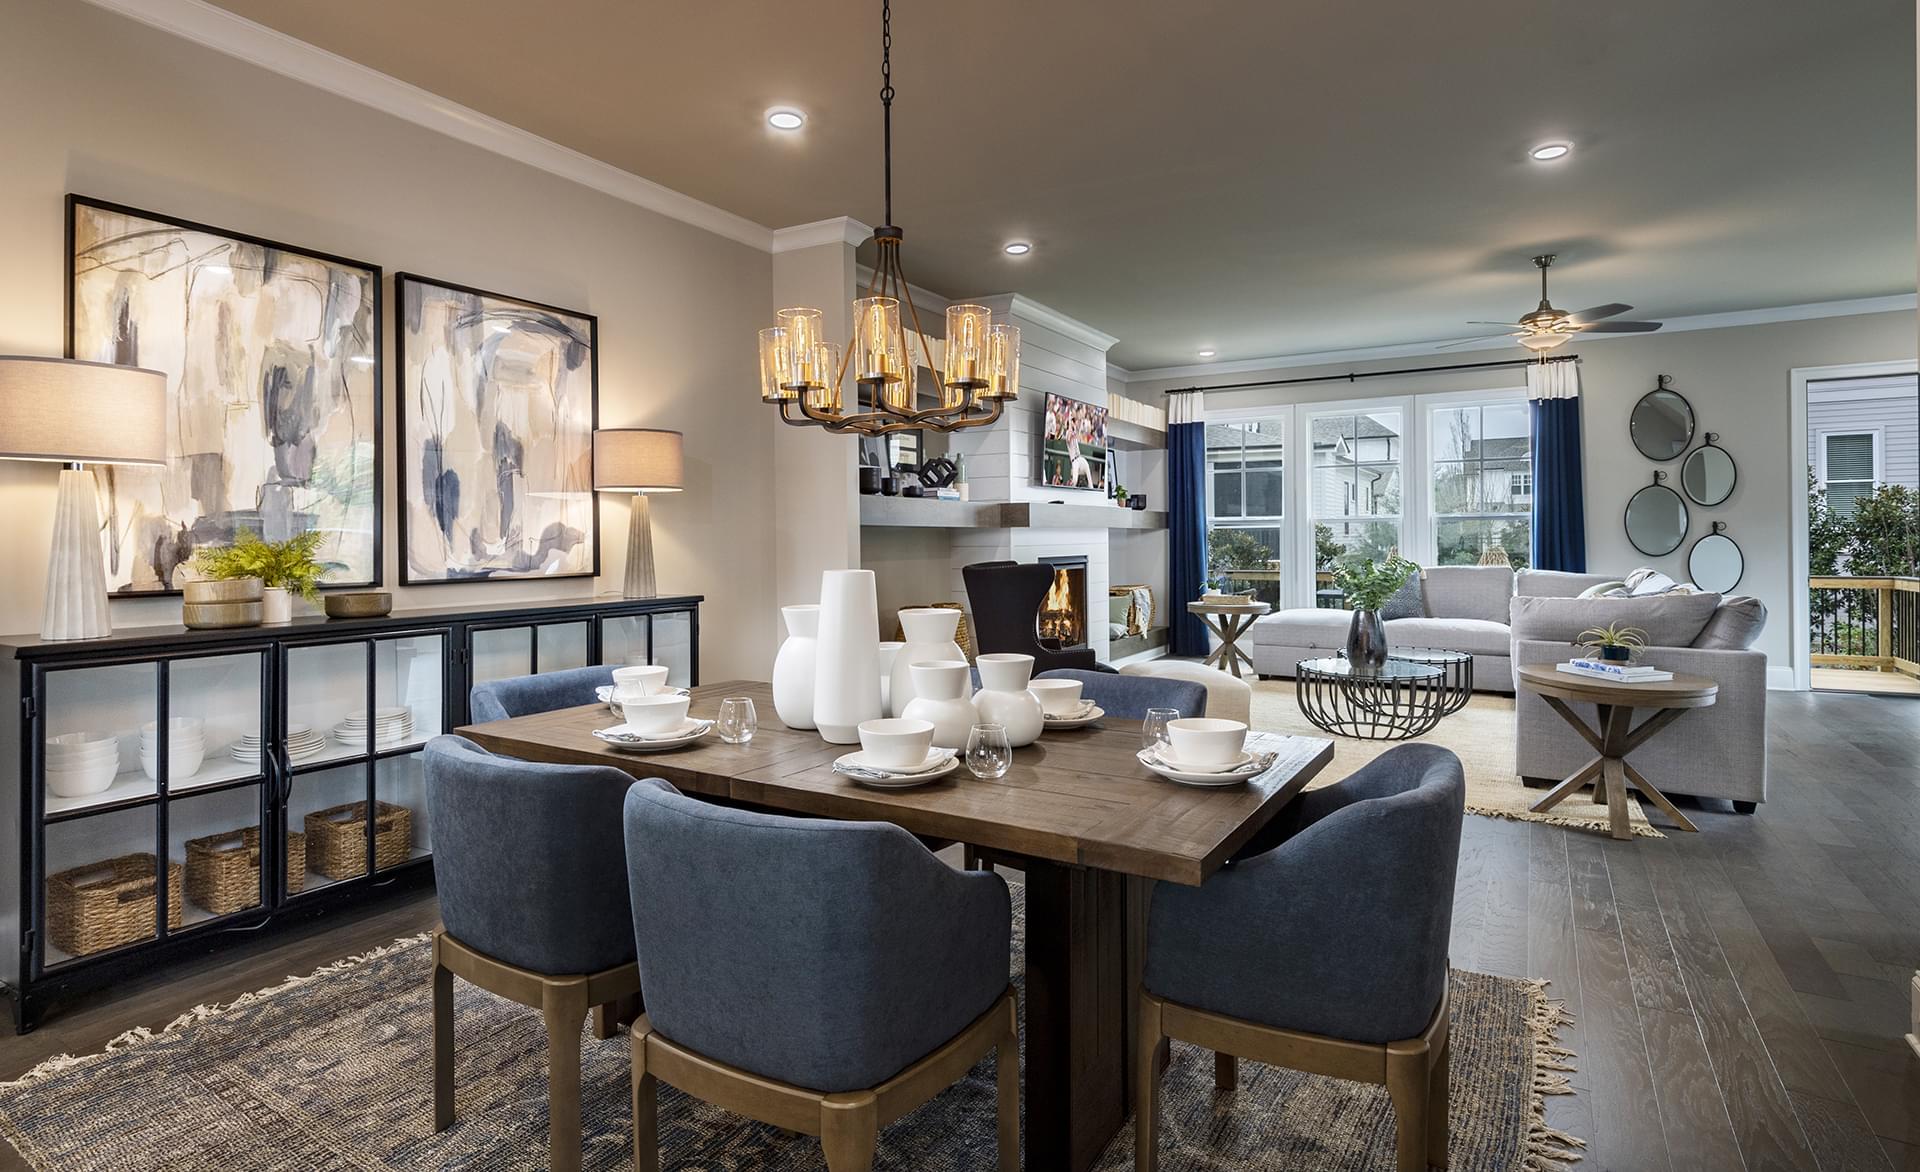 The Sterling New Home in Alpharetta GA